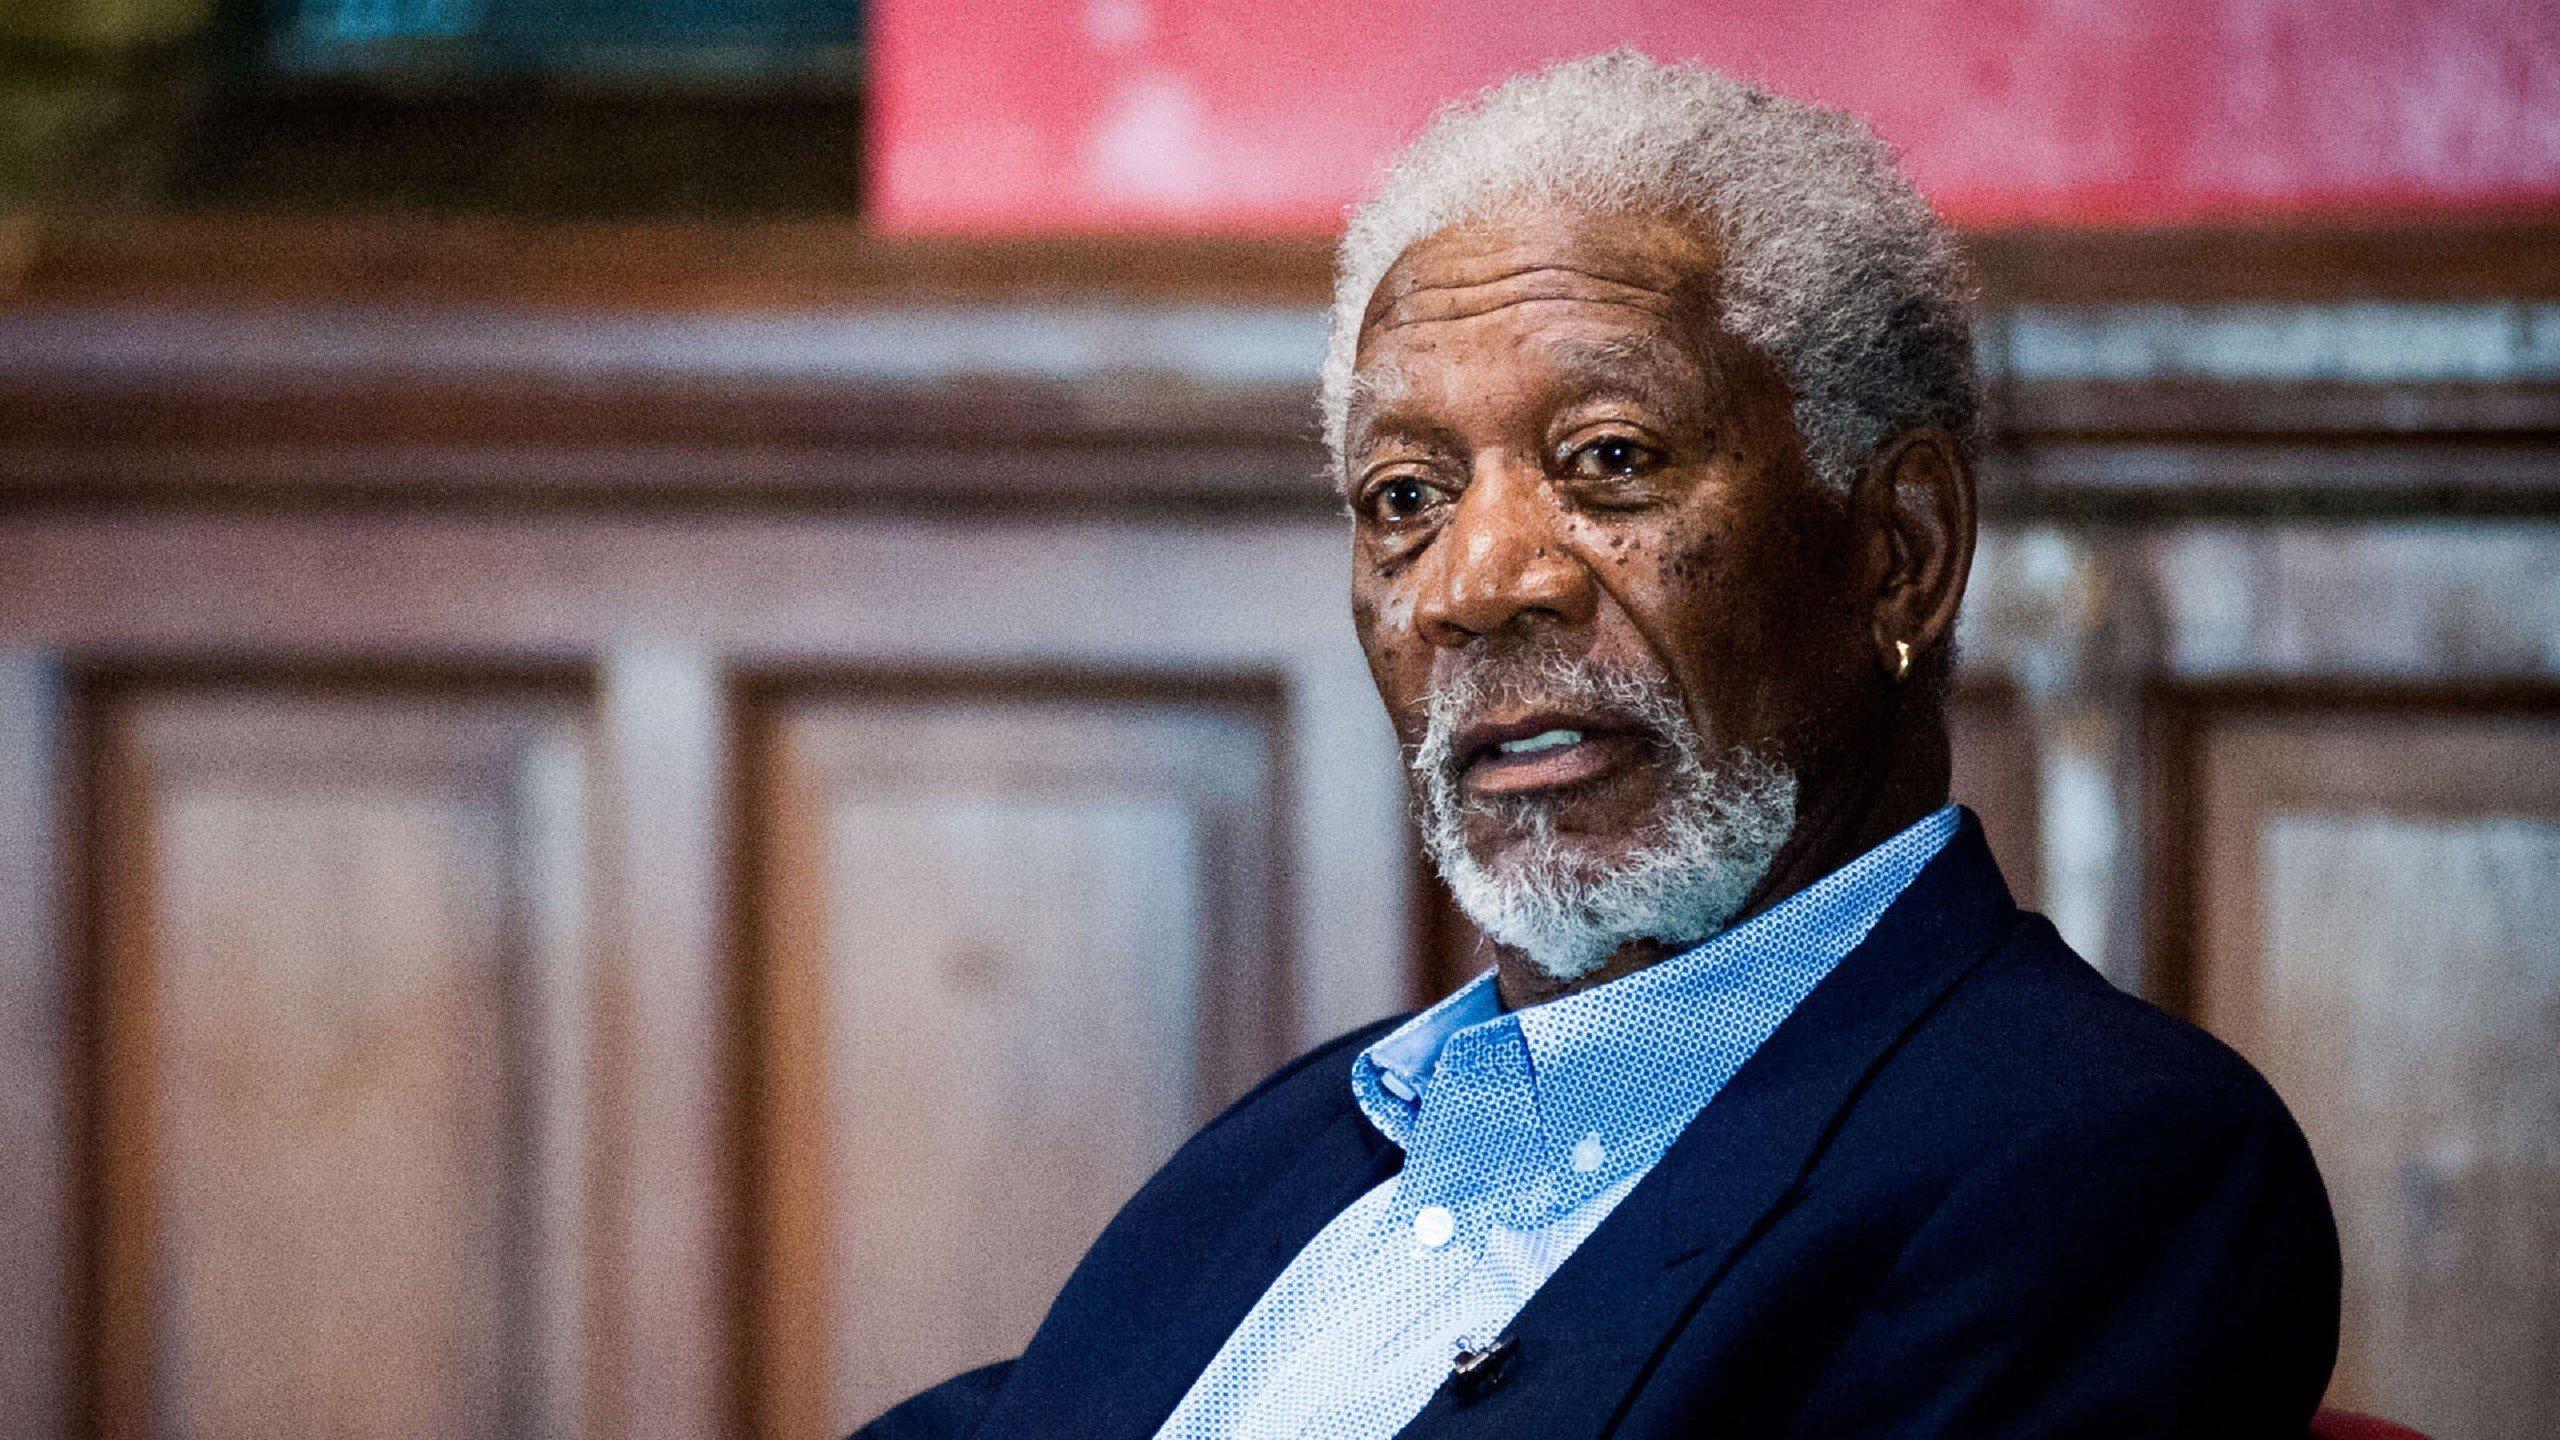 Morgan Freeman Computer Wallpapers